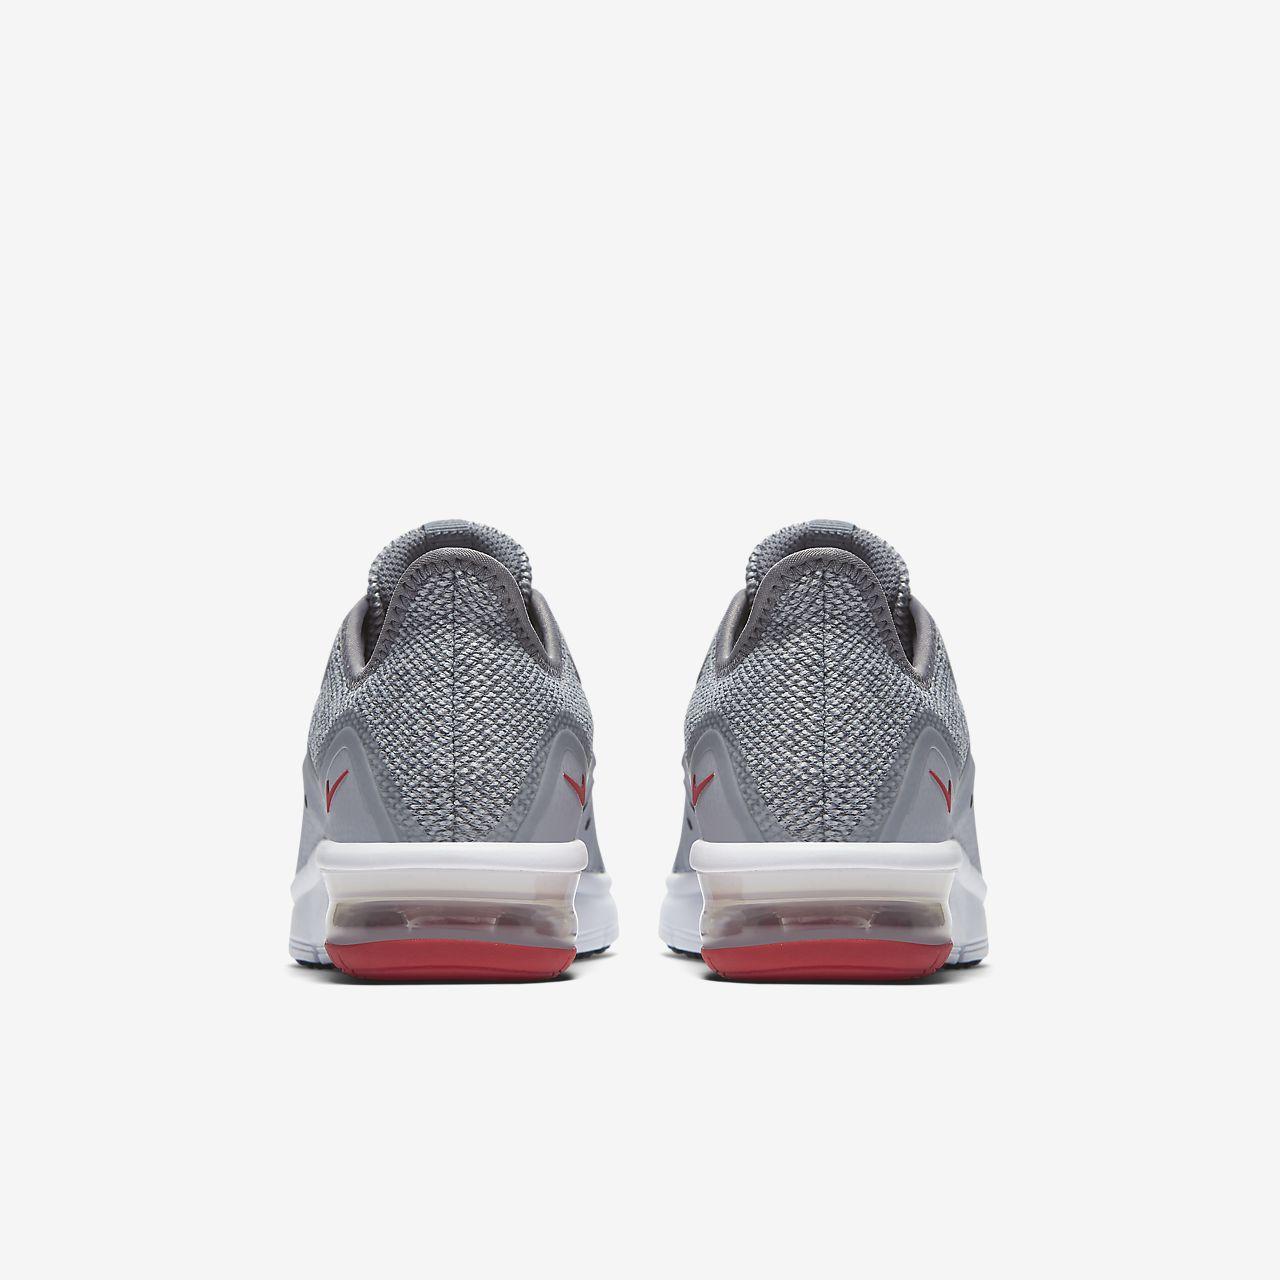 6710bc651b3 Nike Air Max Sequent 3 Older Kids  Shoe. Nike.com LU